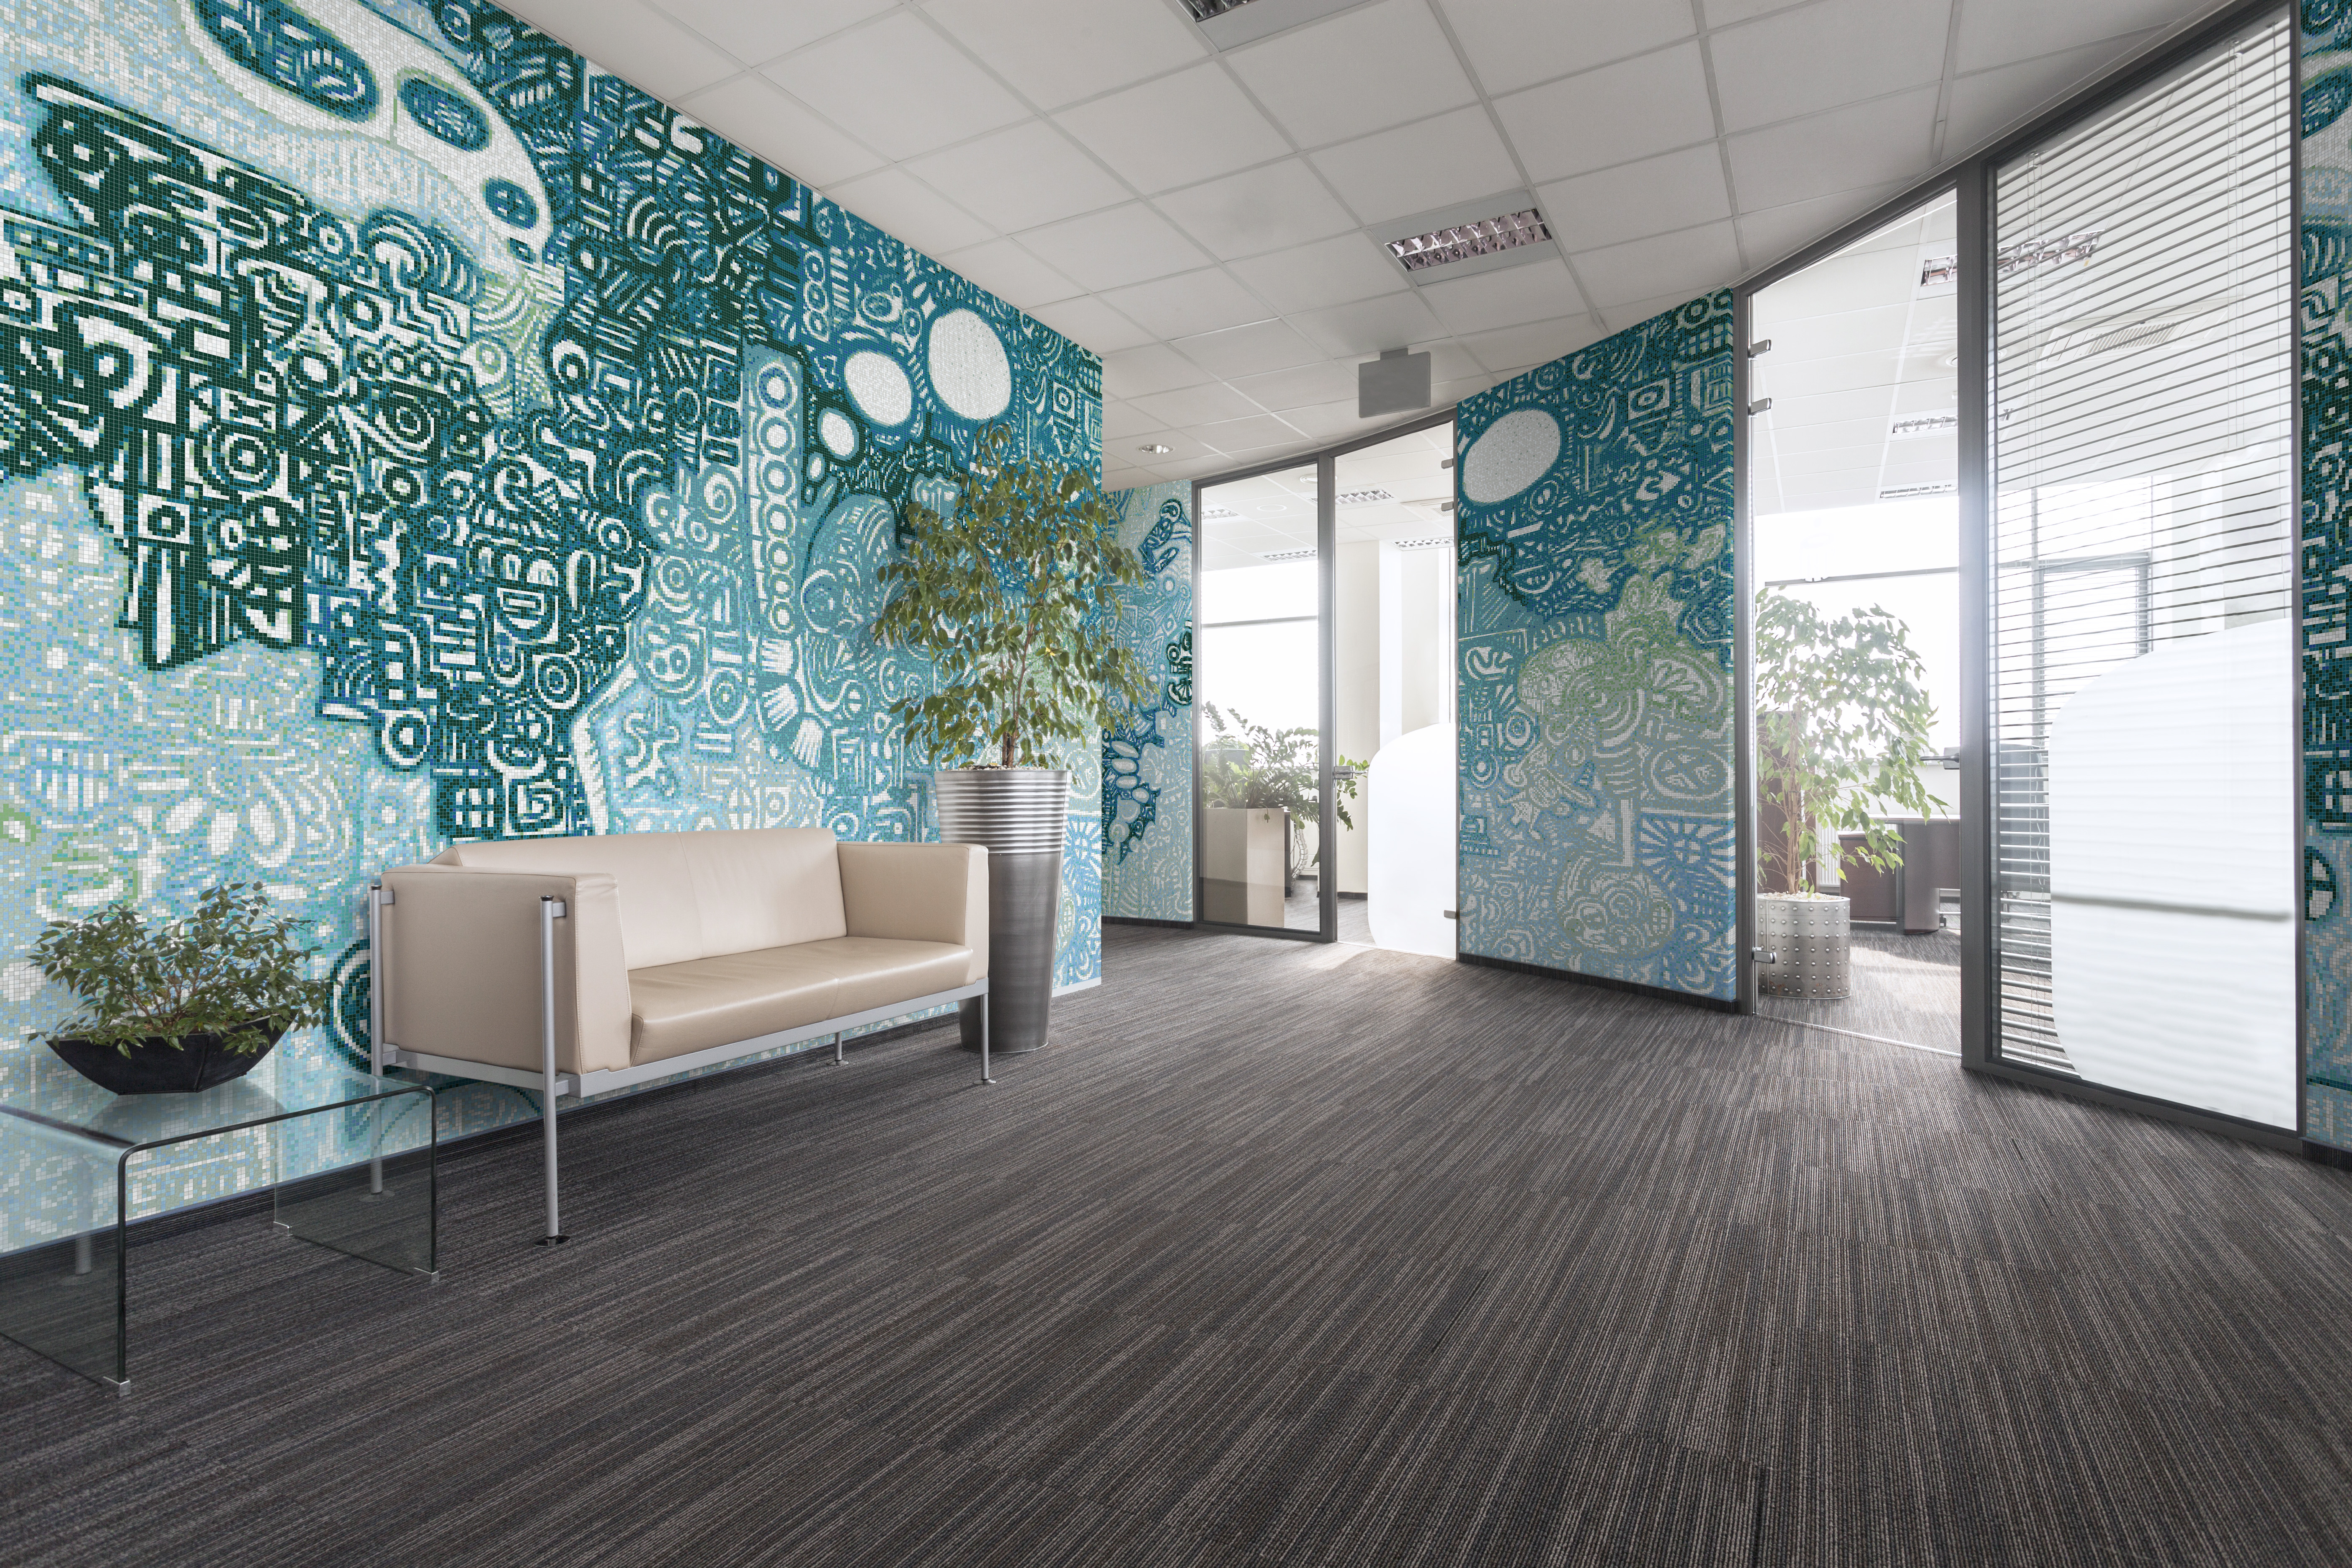 artaic-office-lobby-turquoise-mosaic-tile-mural-0301101